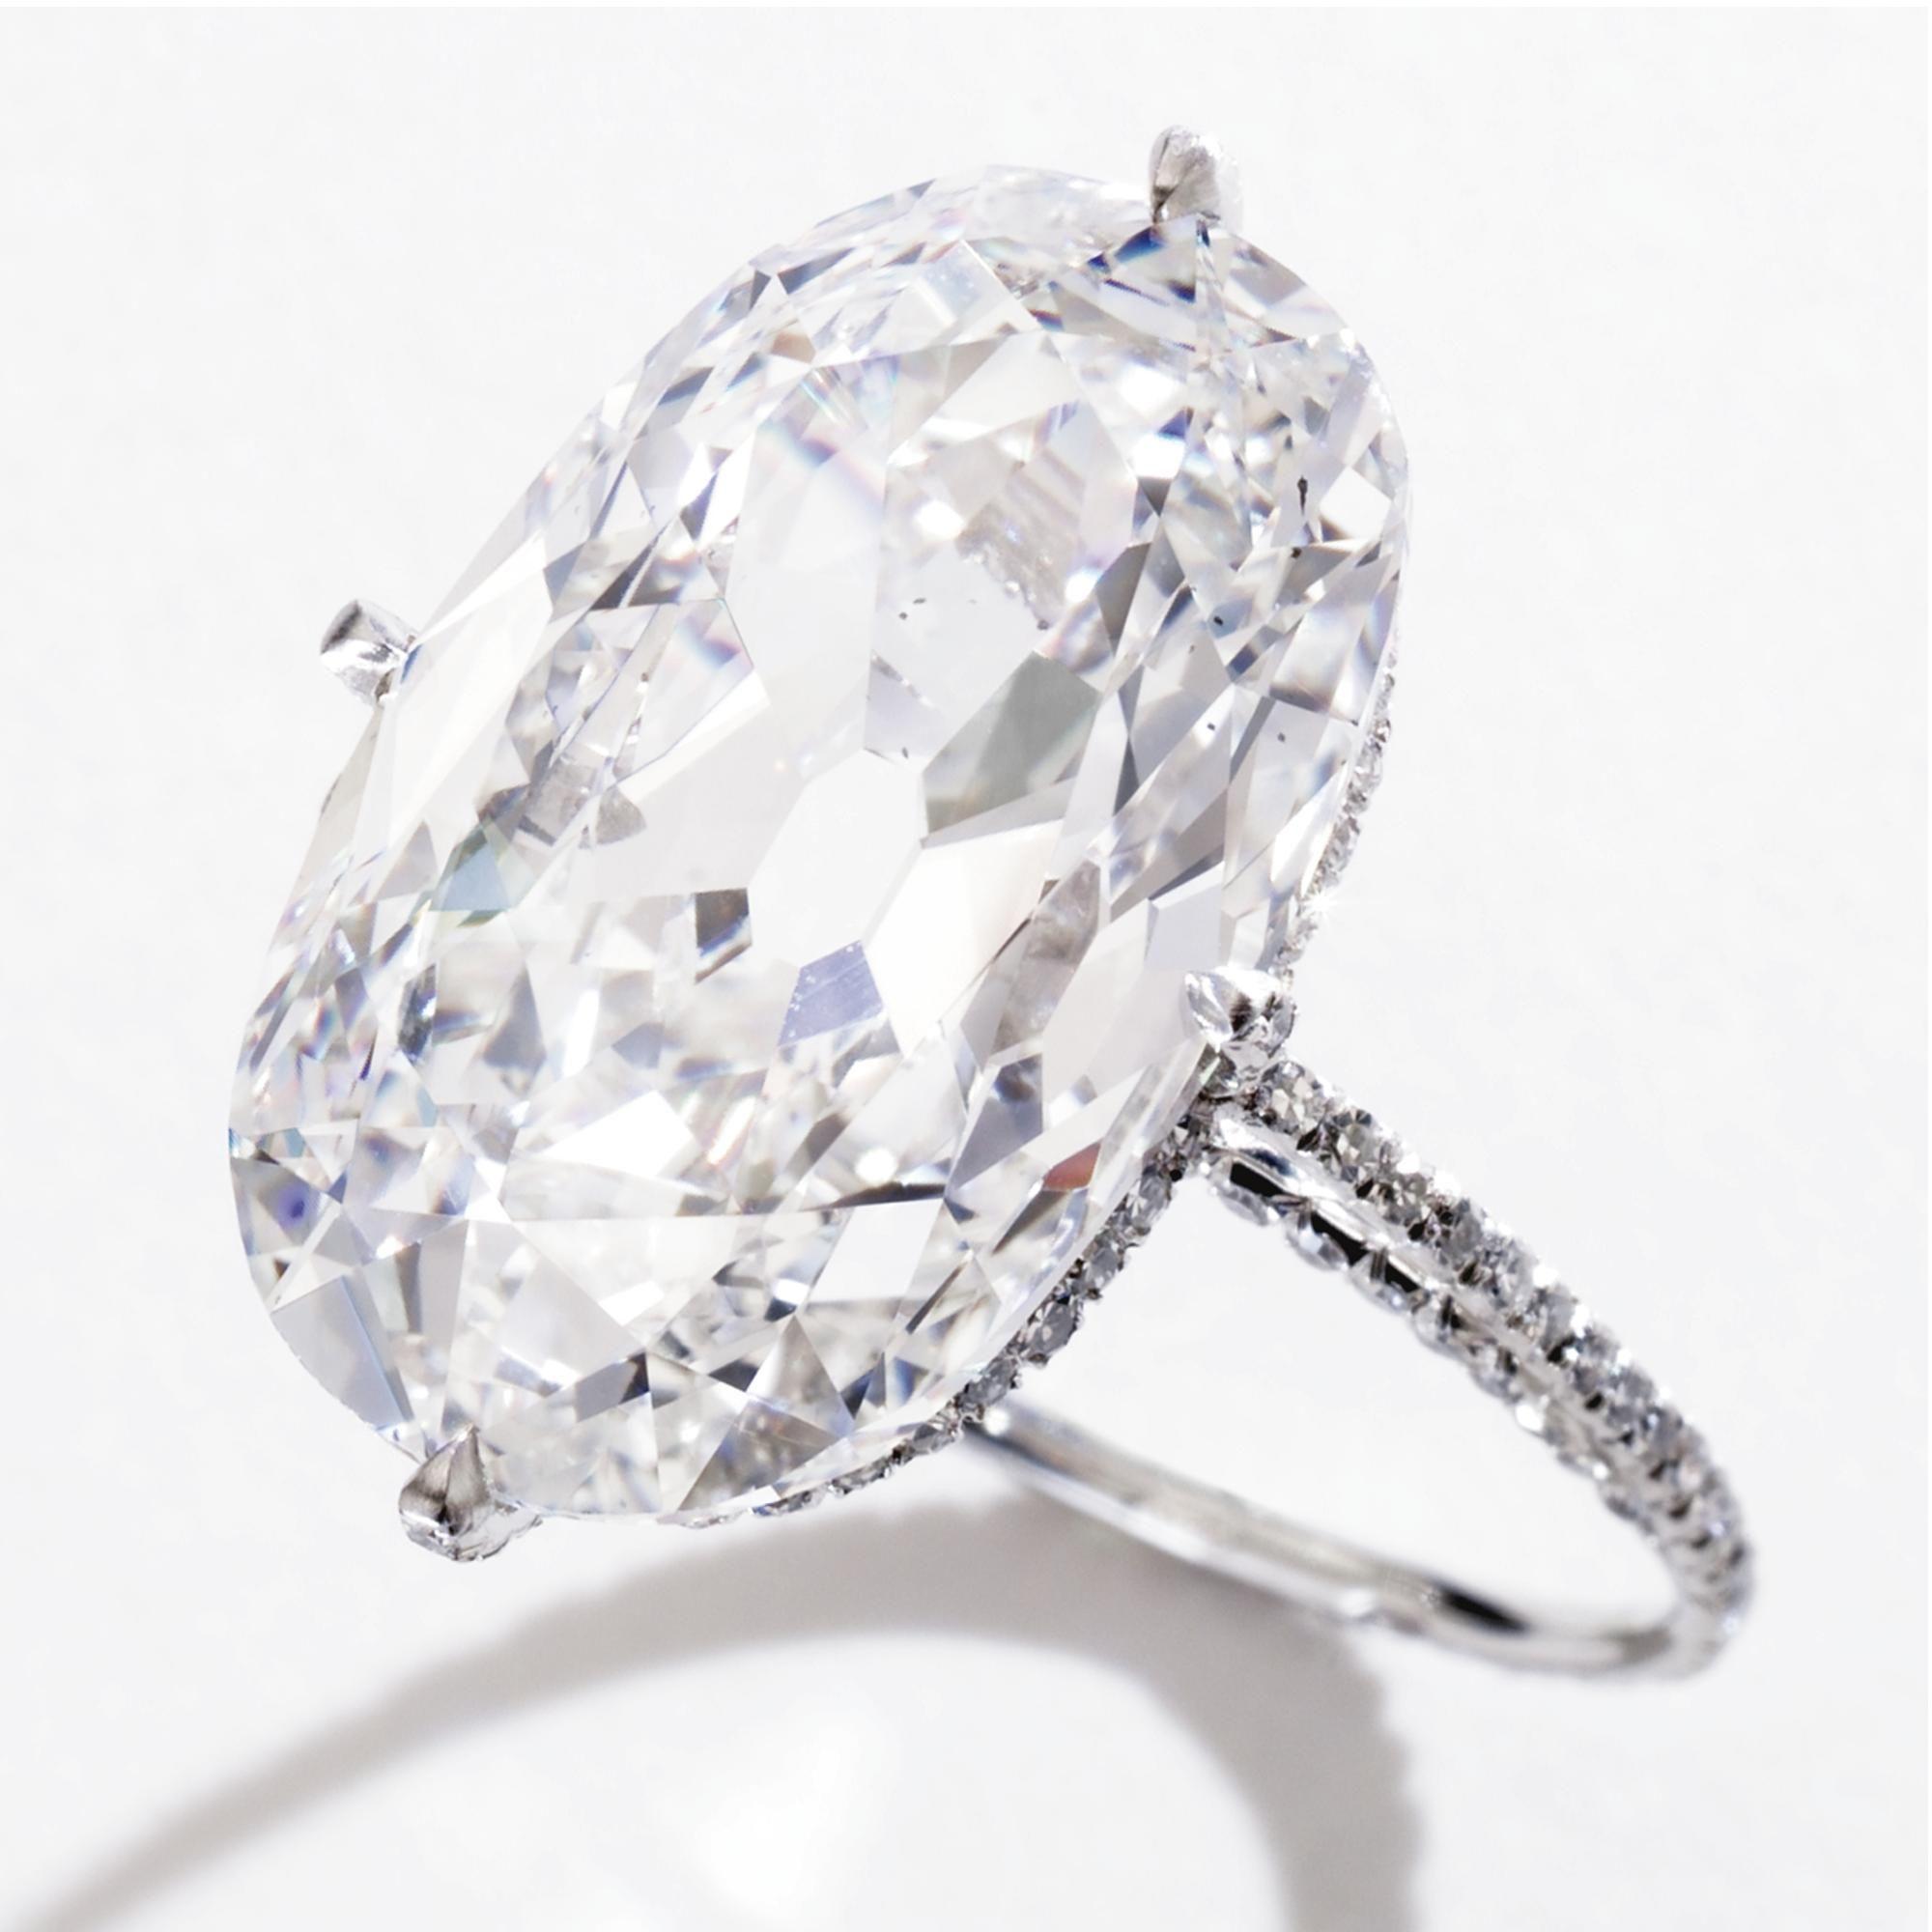 Diamond 'string' Ring, Jar, Paris  Sotheby's